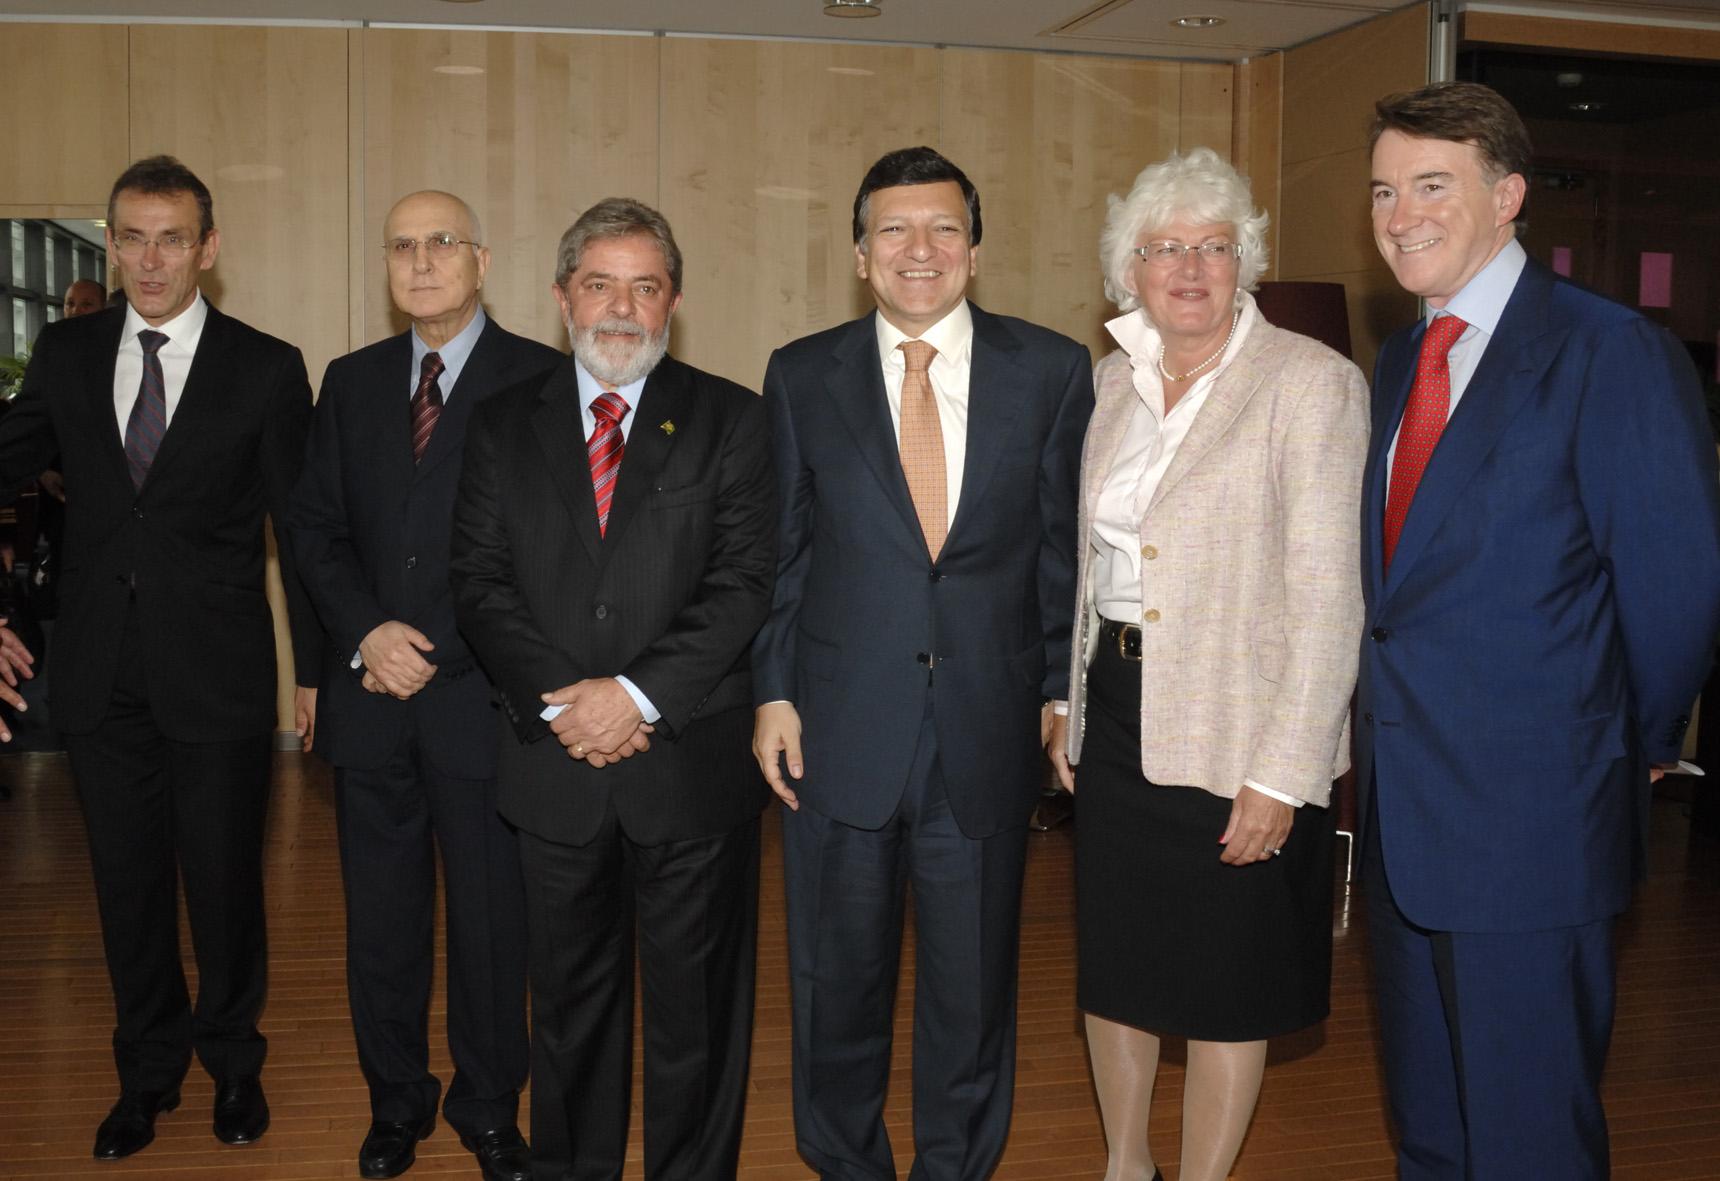 Visit by Luiz Inácio Lula da Silva, President of Brazil, to the EC